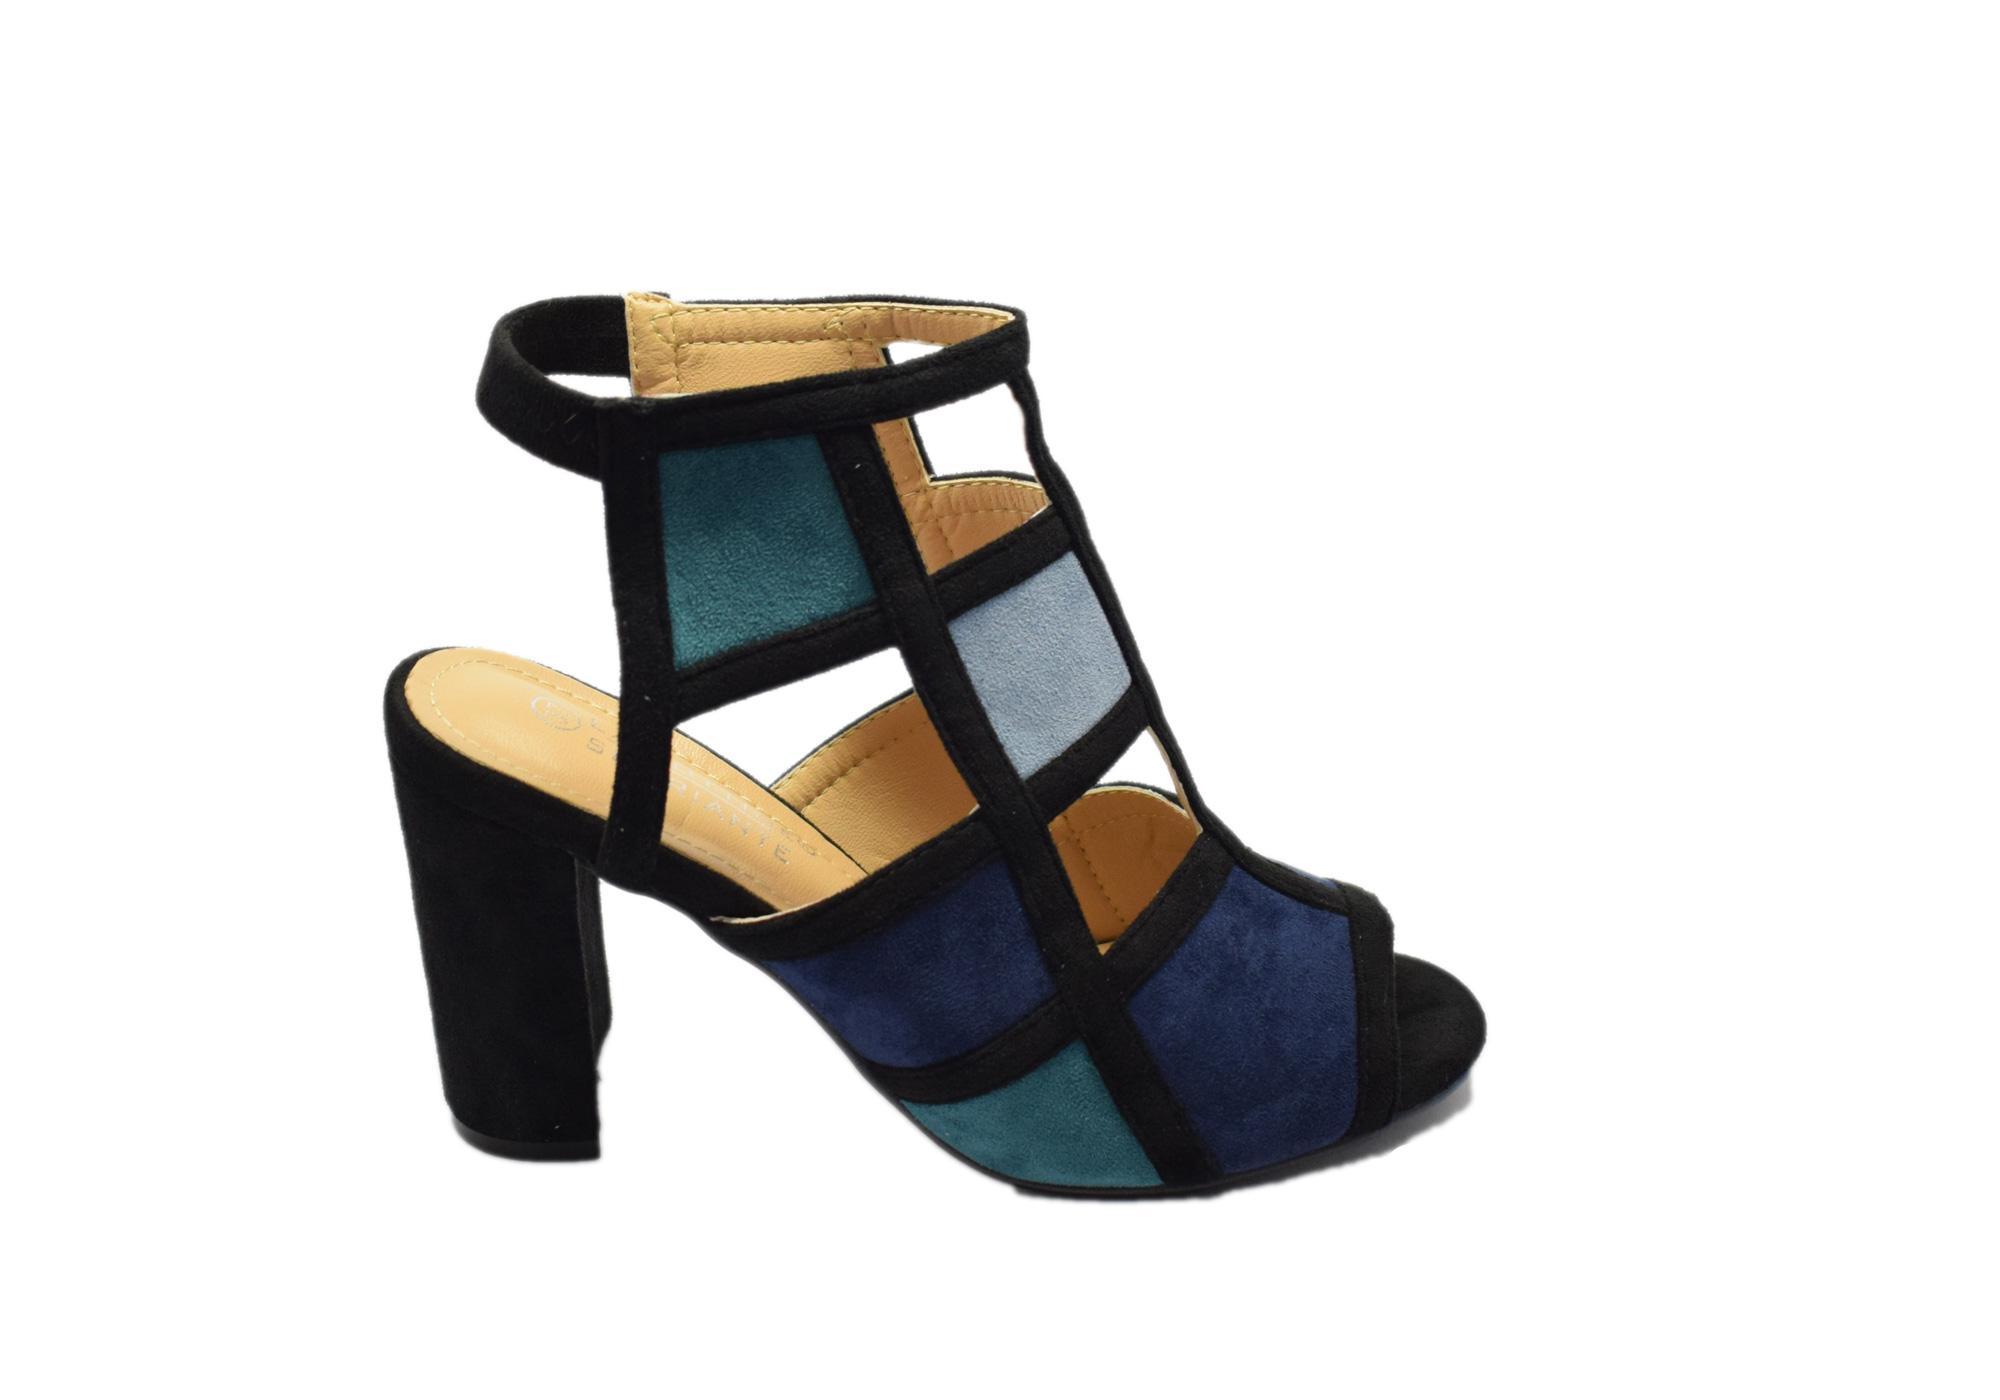 941b1e3d79c Πέδιλο Μαύρο με μπλε λεπτομέρειες - Γυναικεία Παπούτσια - Steve & Paul